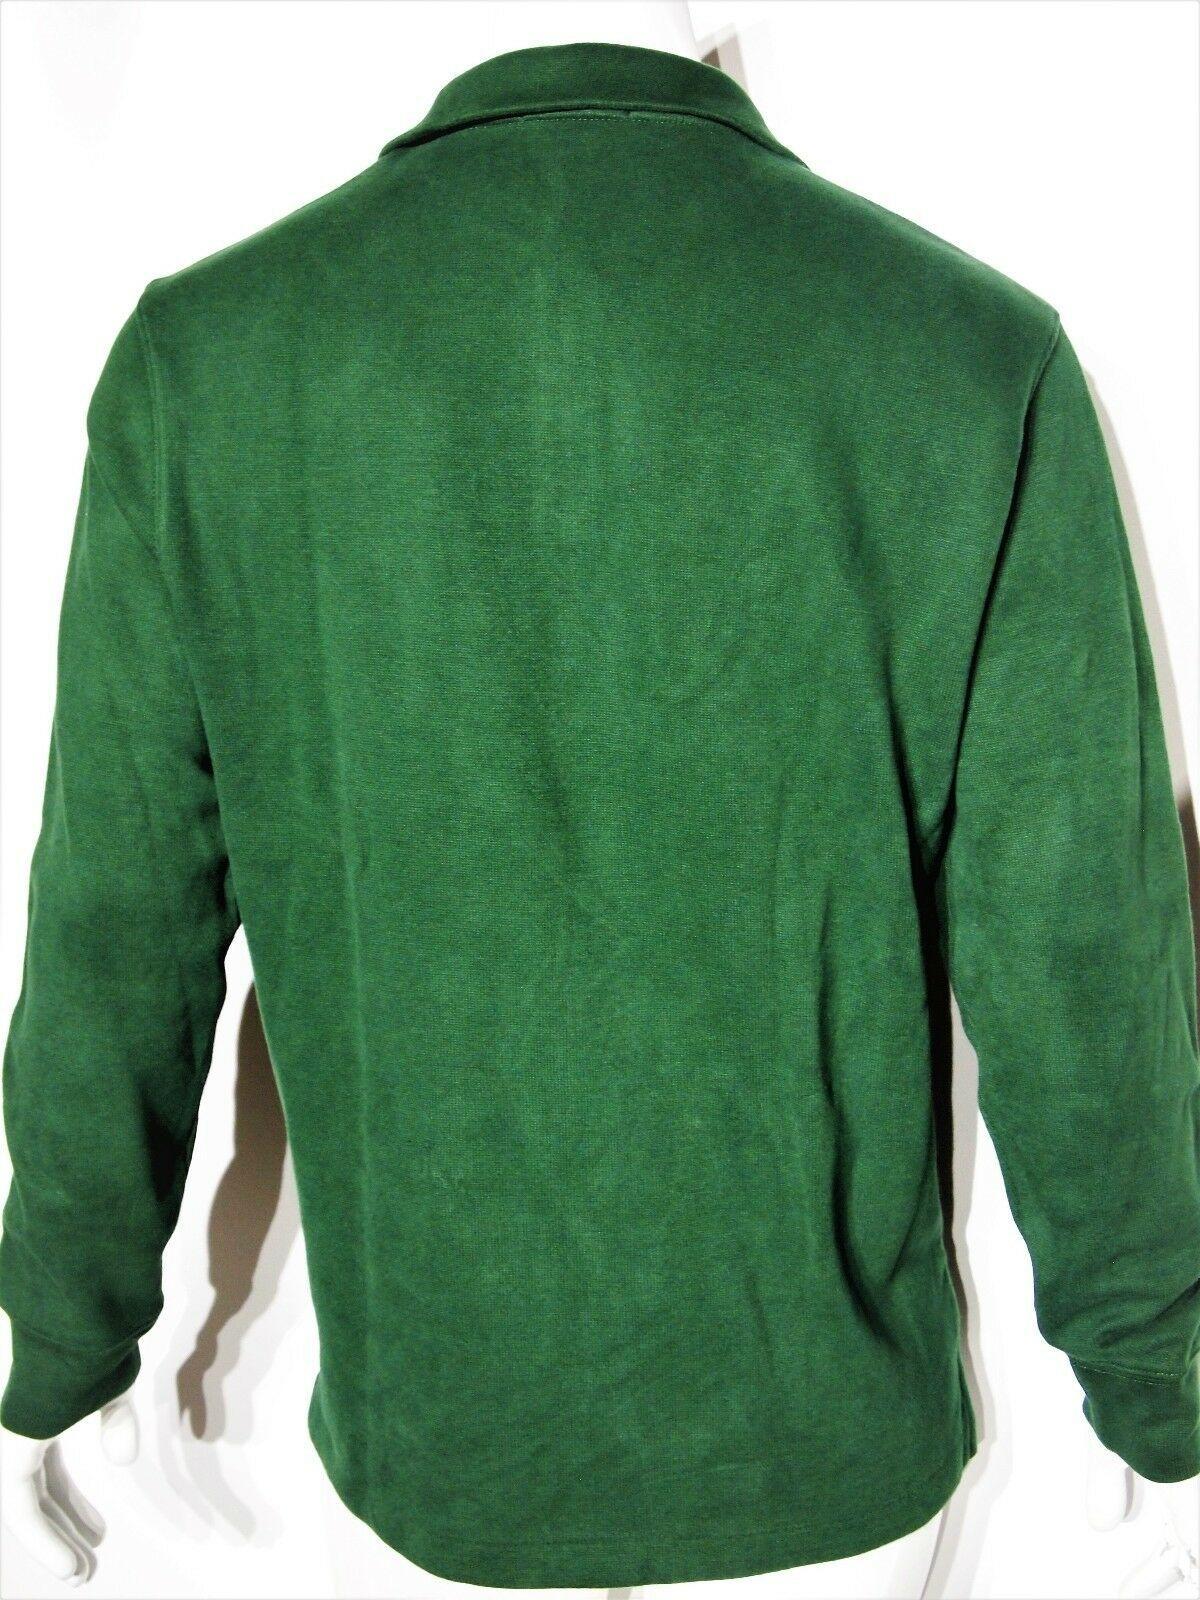 Polo Ralph Lauren size xxl french rib half zip sweater